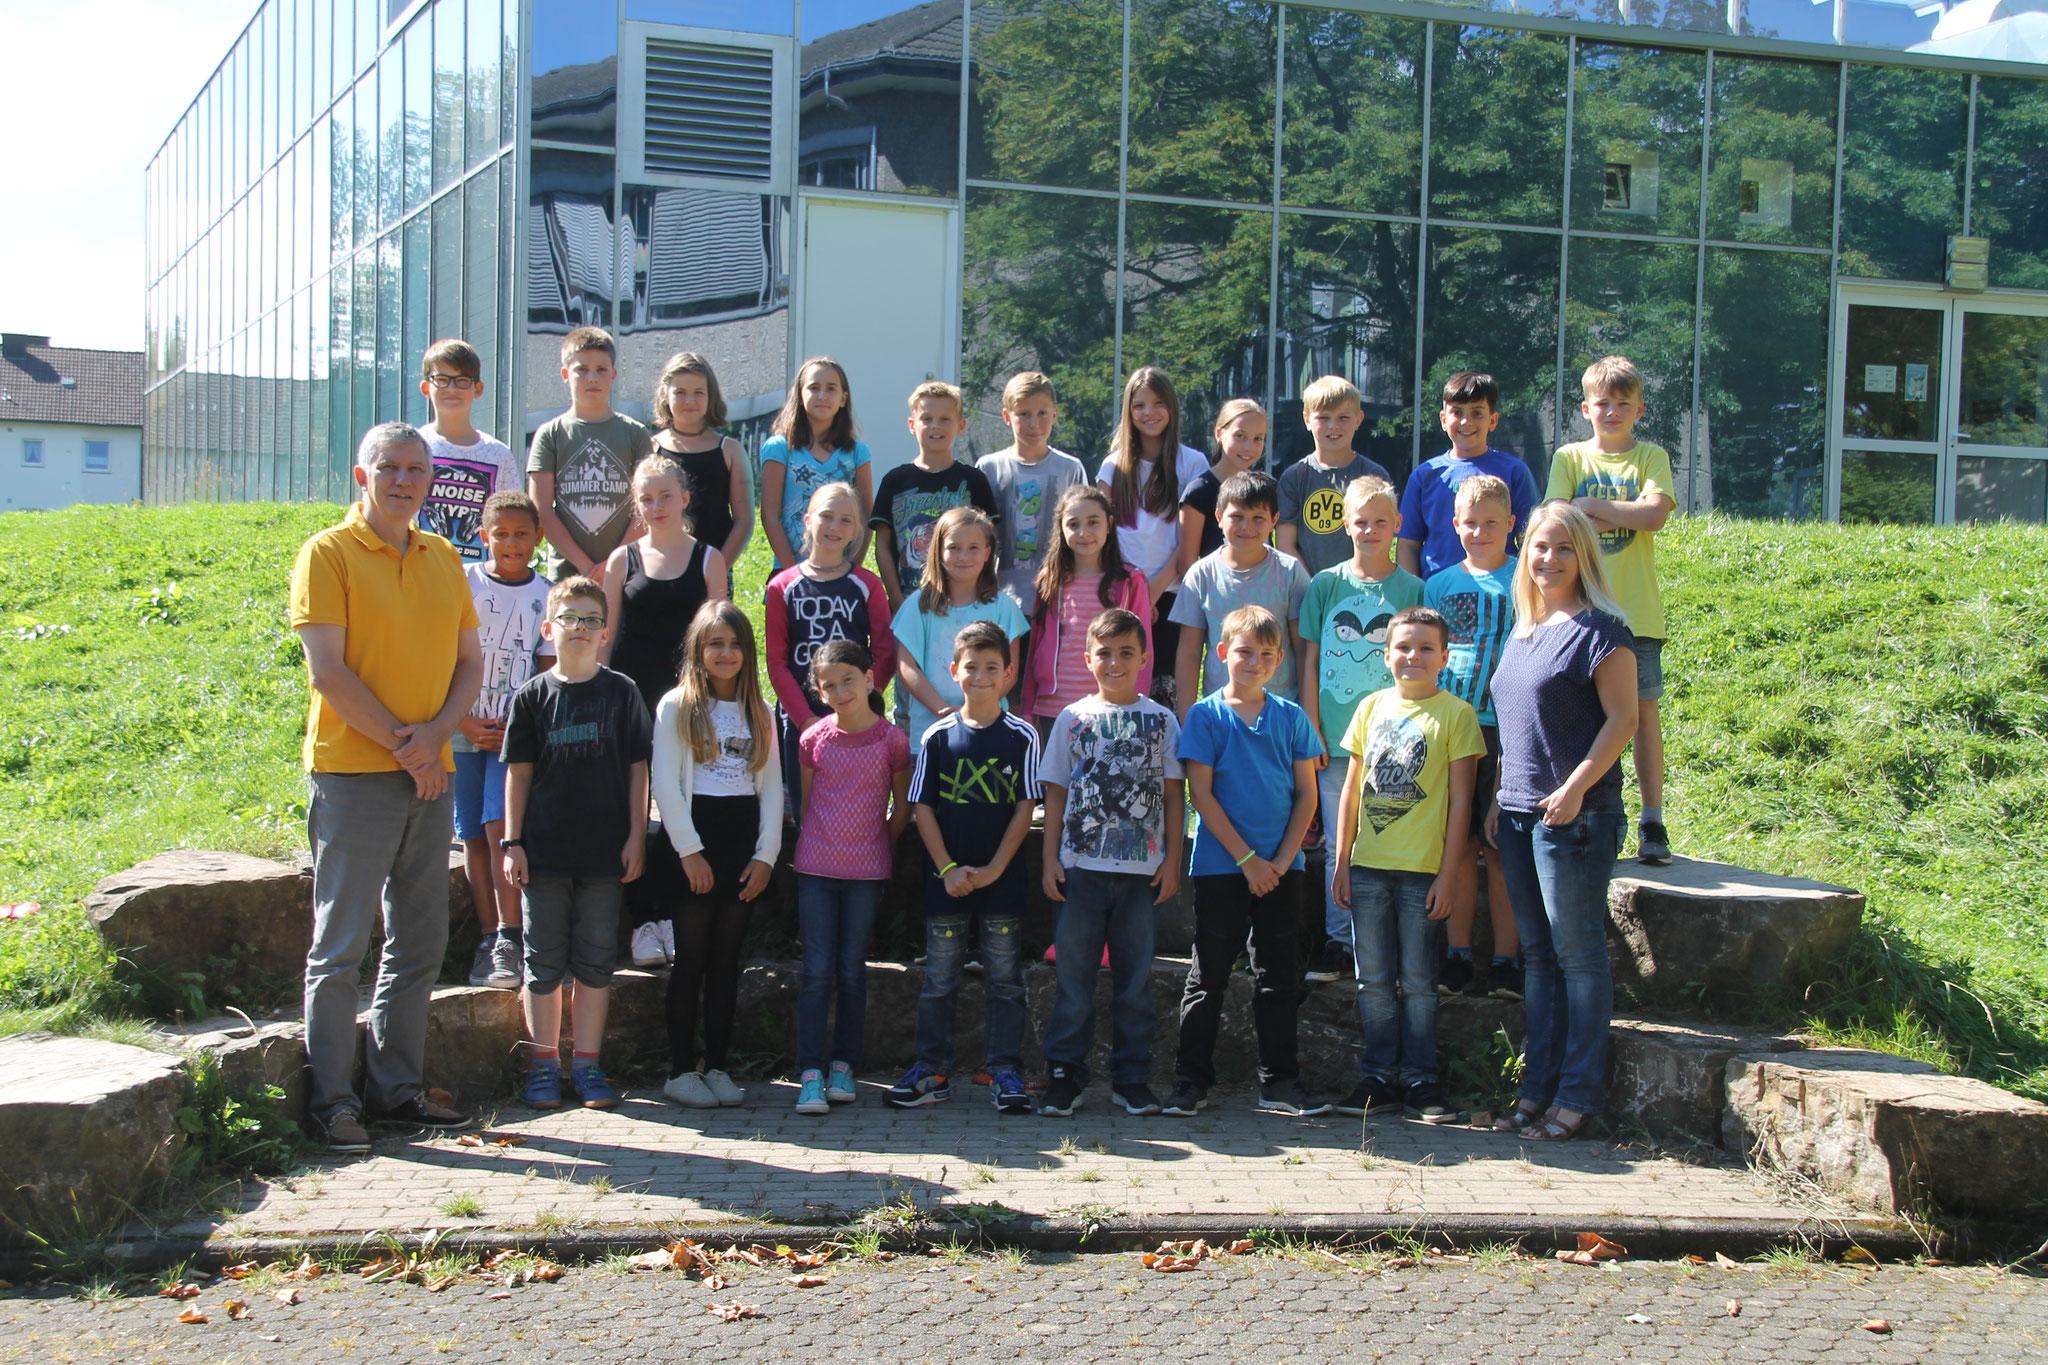 Klasse 5b: Klassenlehrer Frau Bäcker und Herr Schaaf